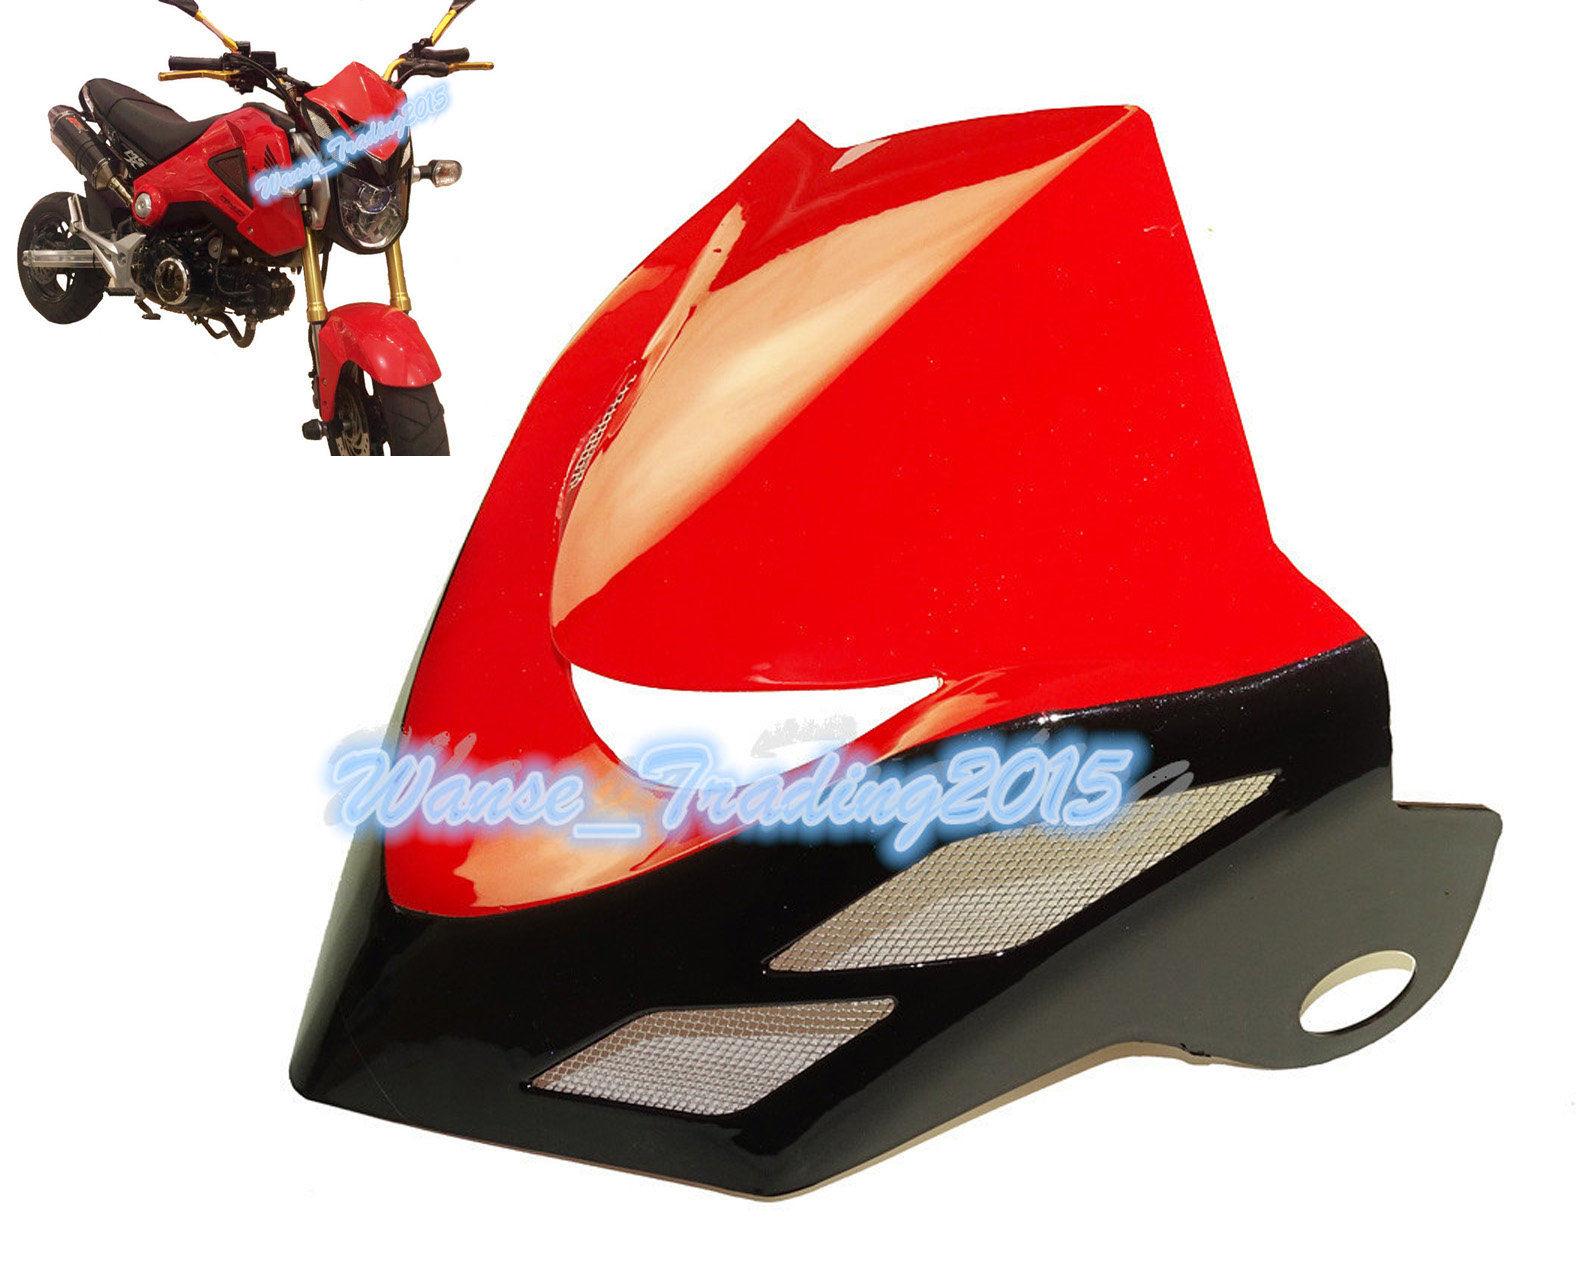 Front Upper Cowl Headlight Headlamp Head Light Lamp Cover Wind Shield Screen Red 2013 2014 2015 HONDA Grom MSX 125 MSX125 - Fast_Furious2015 store